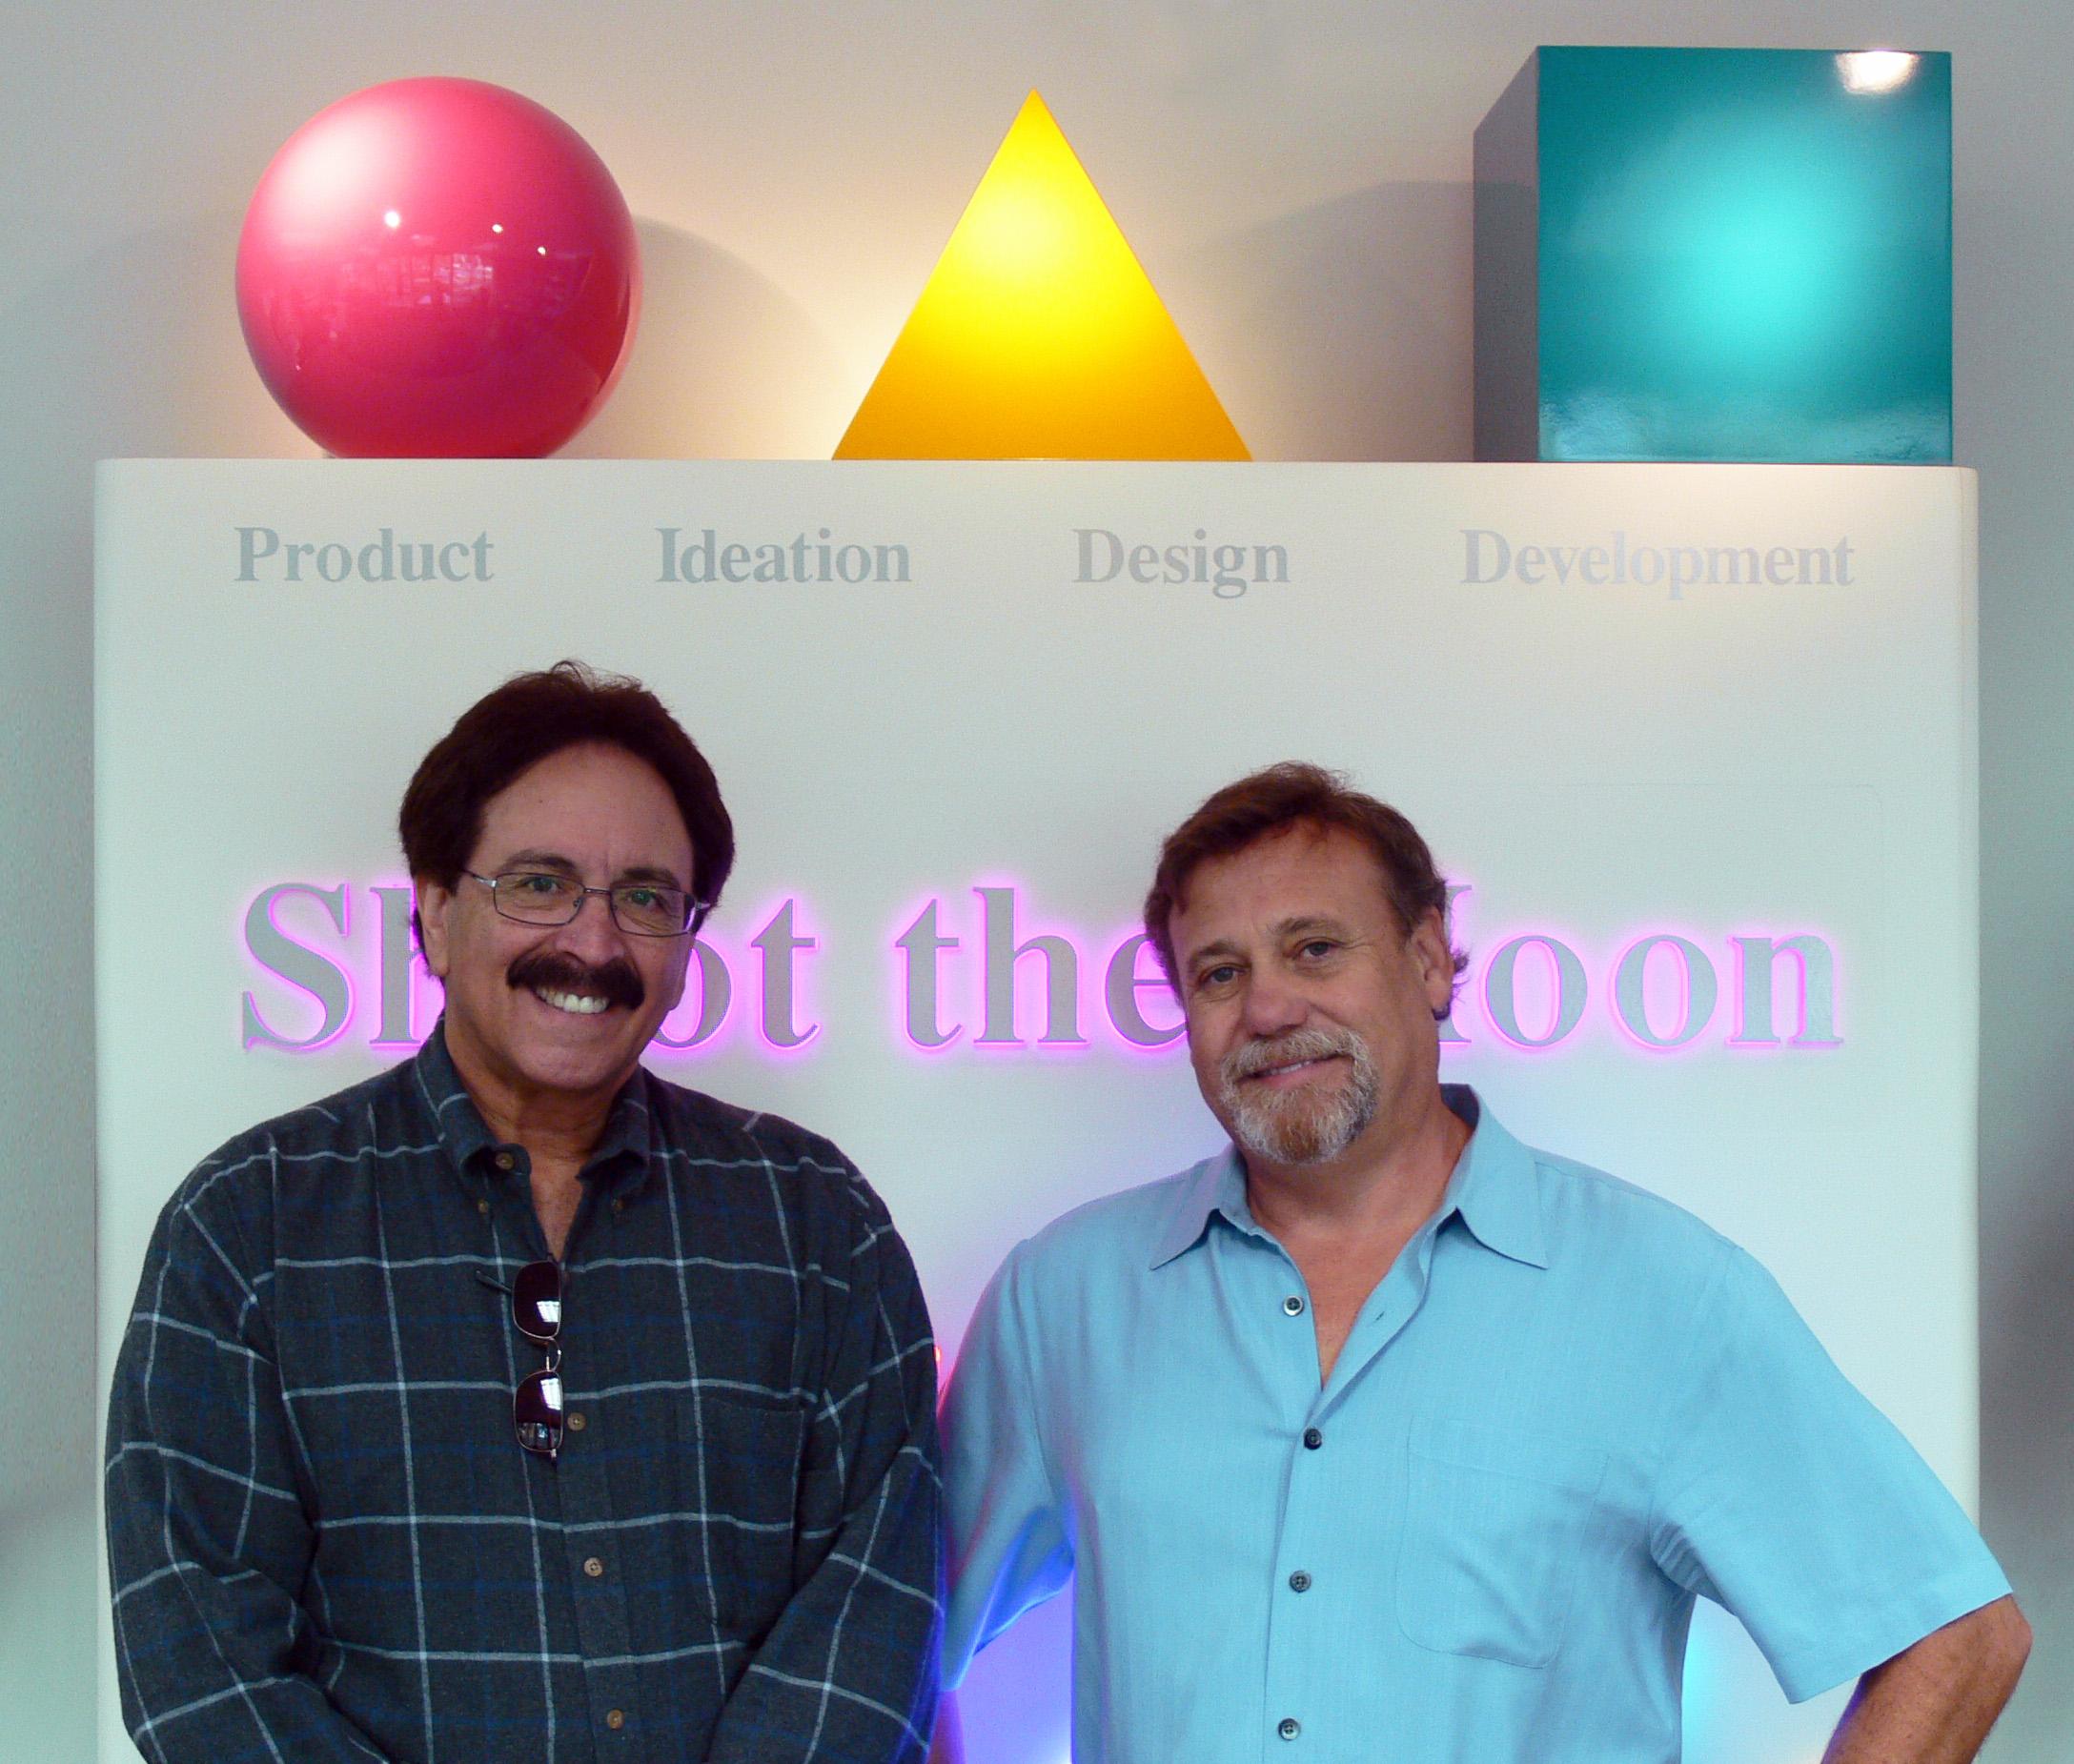 Paul Rago and David Small